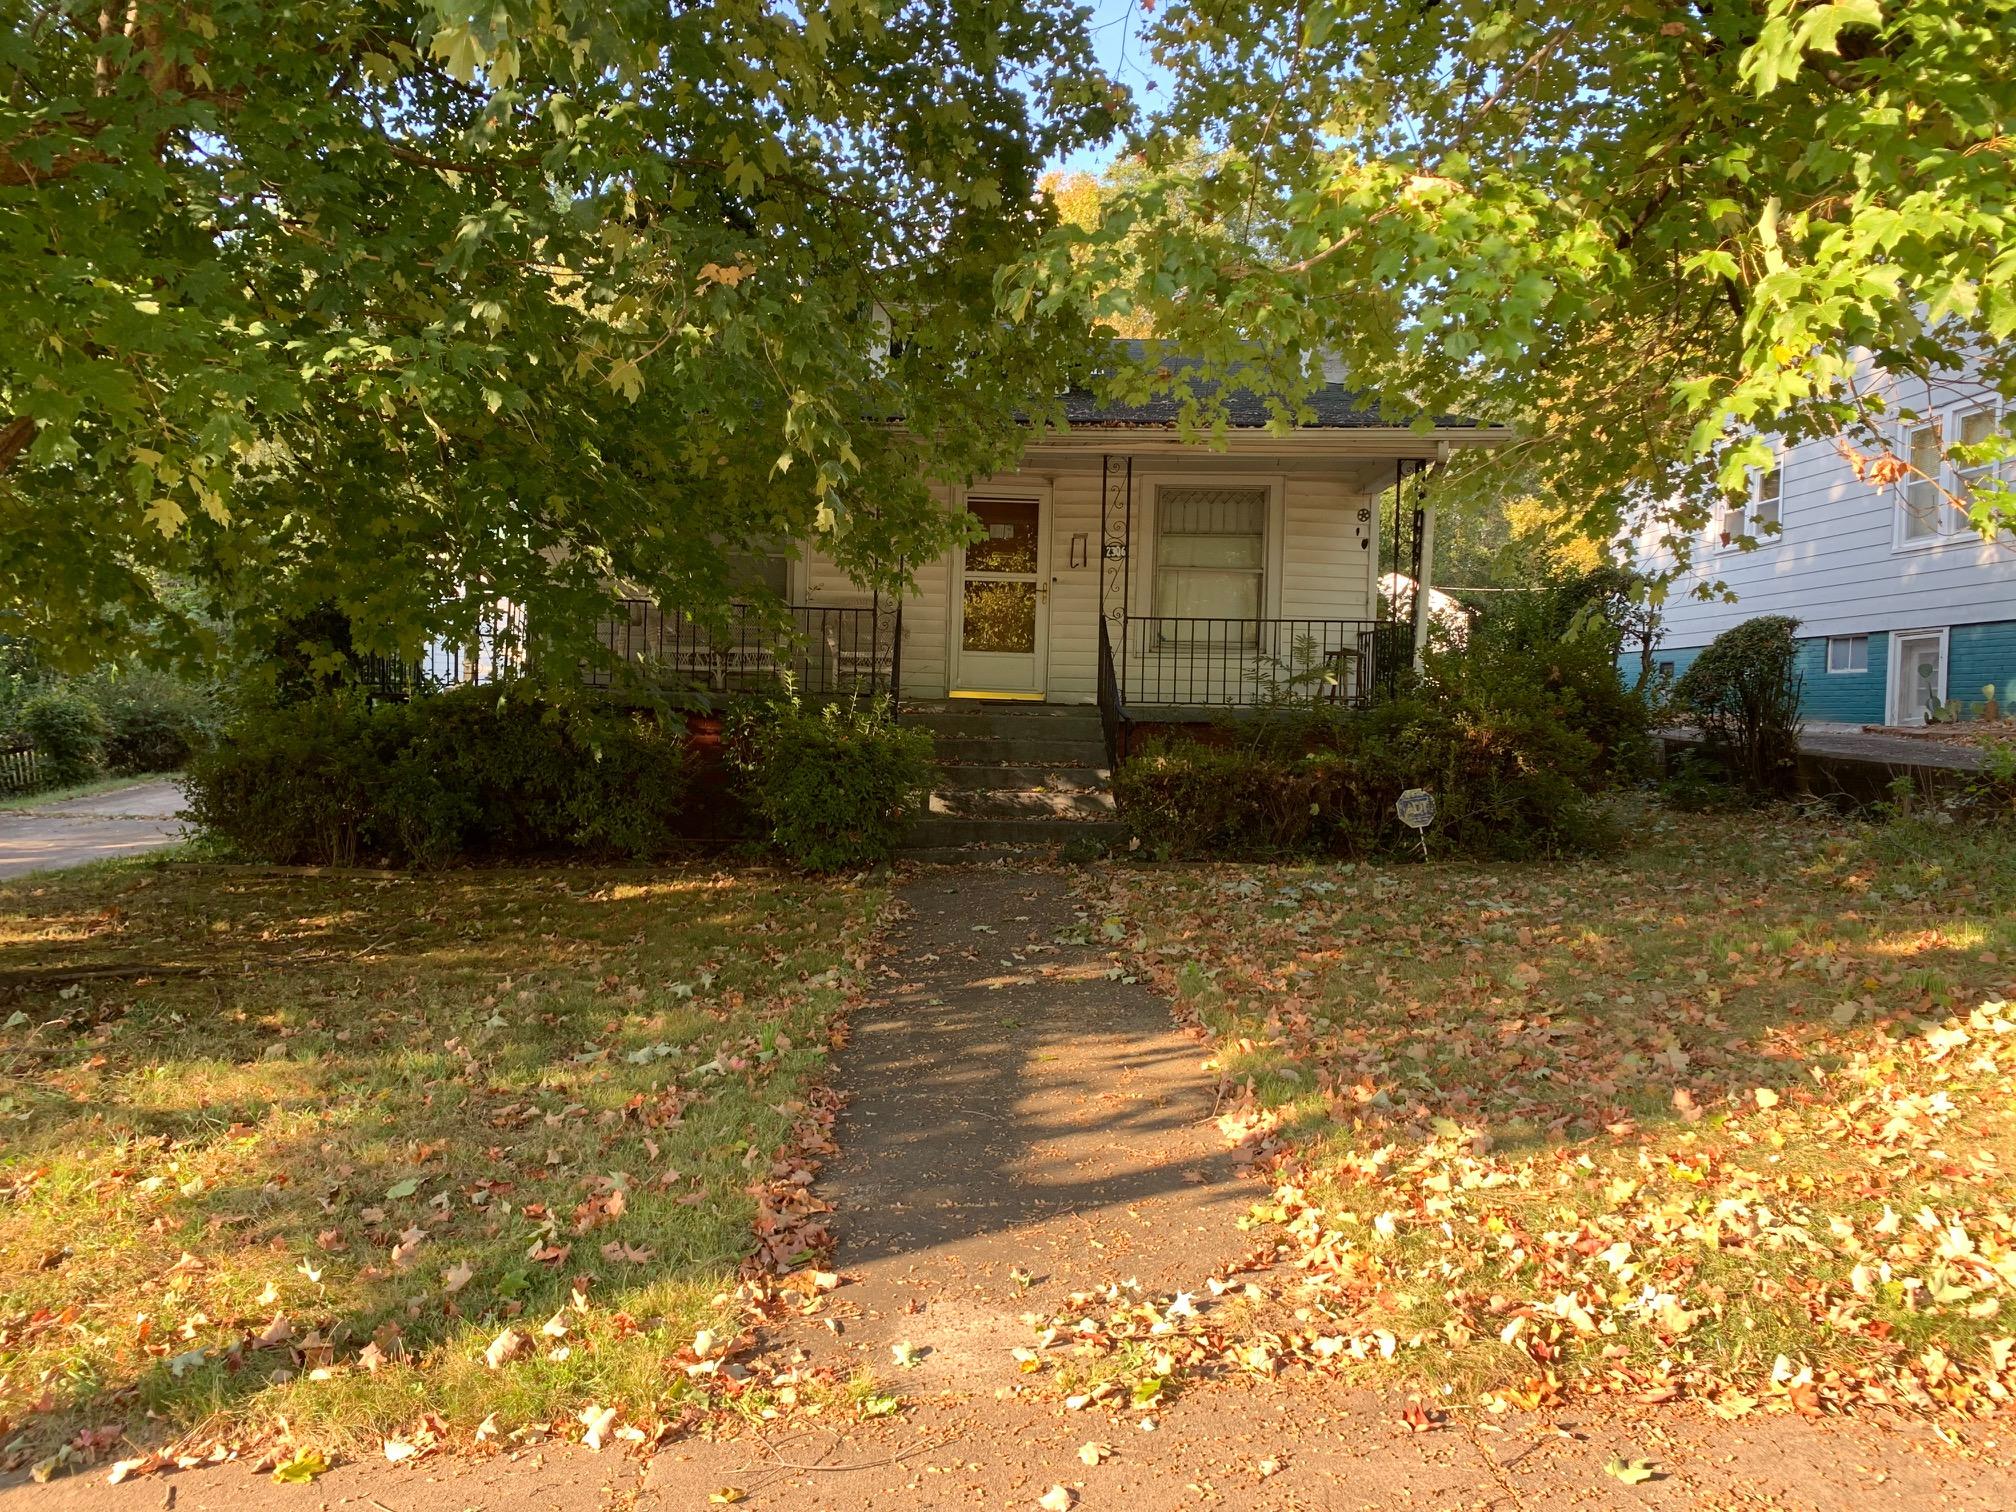 2306 Greenway Ave NW, Winston-Salem, NC